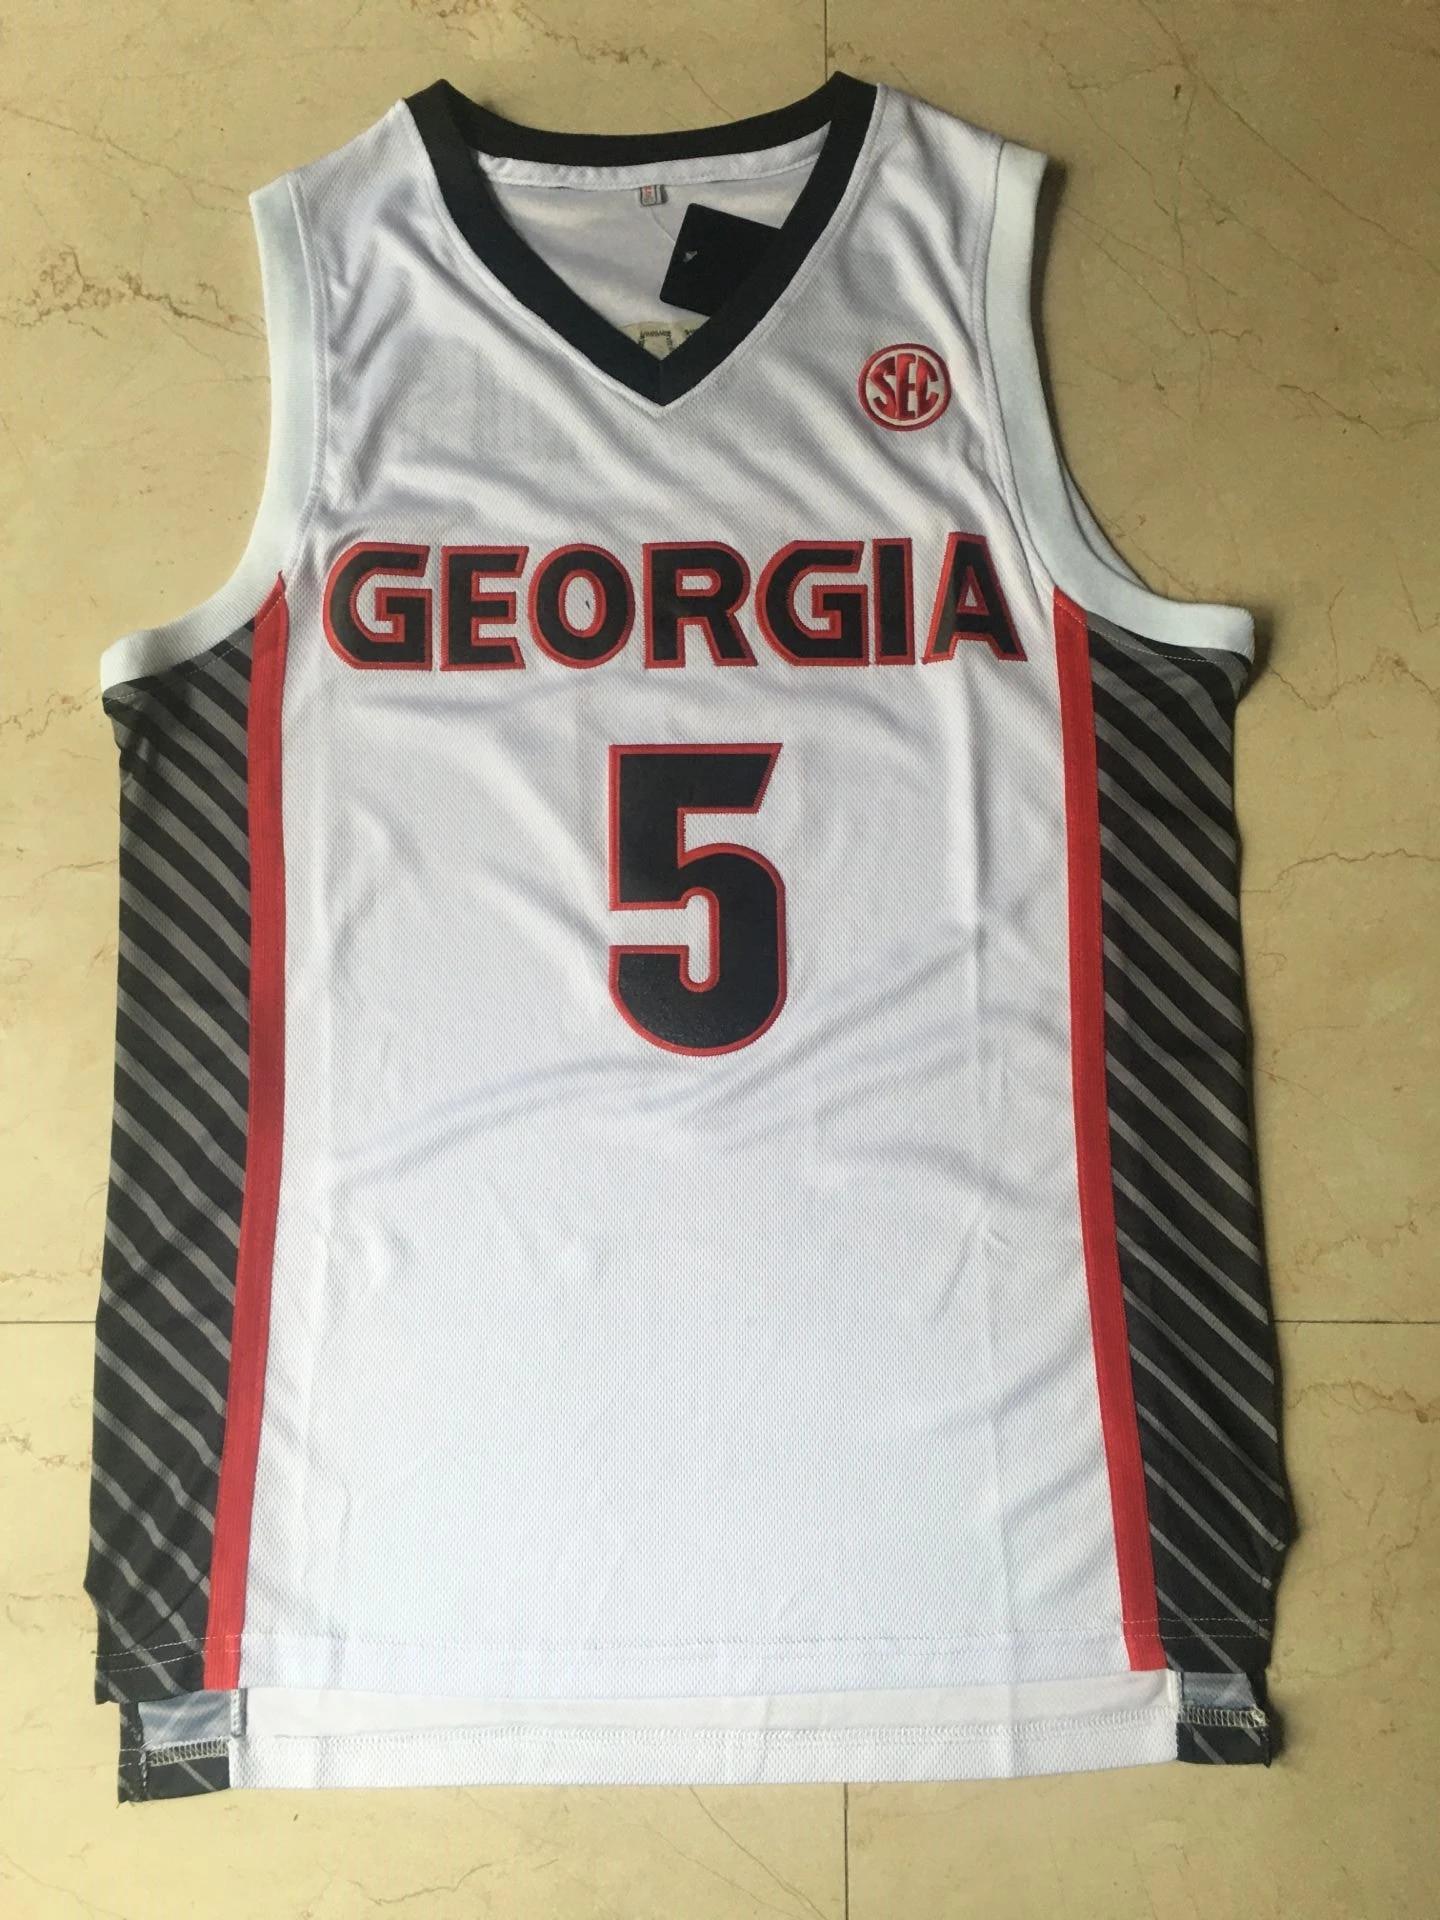 aliexpress georgia jersey